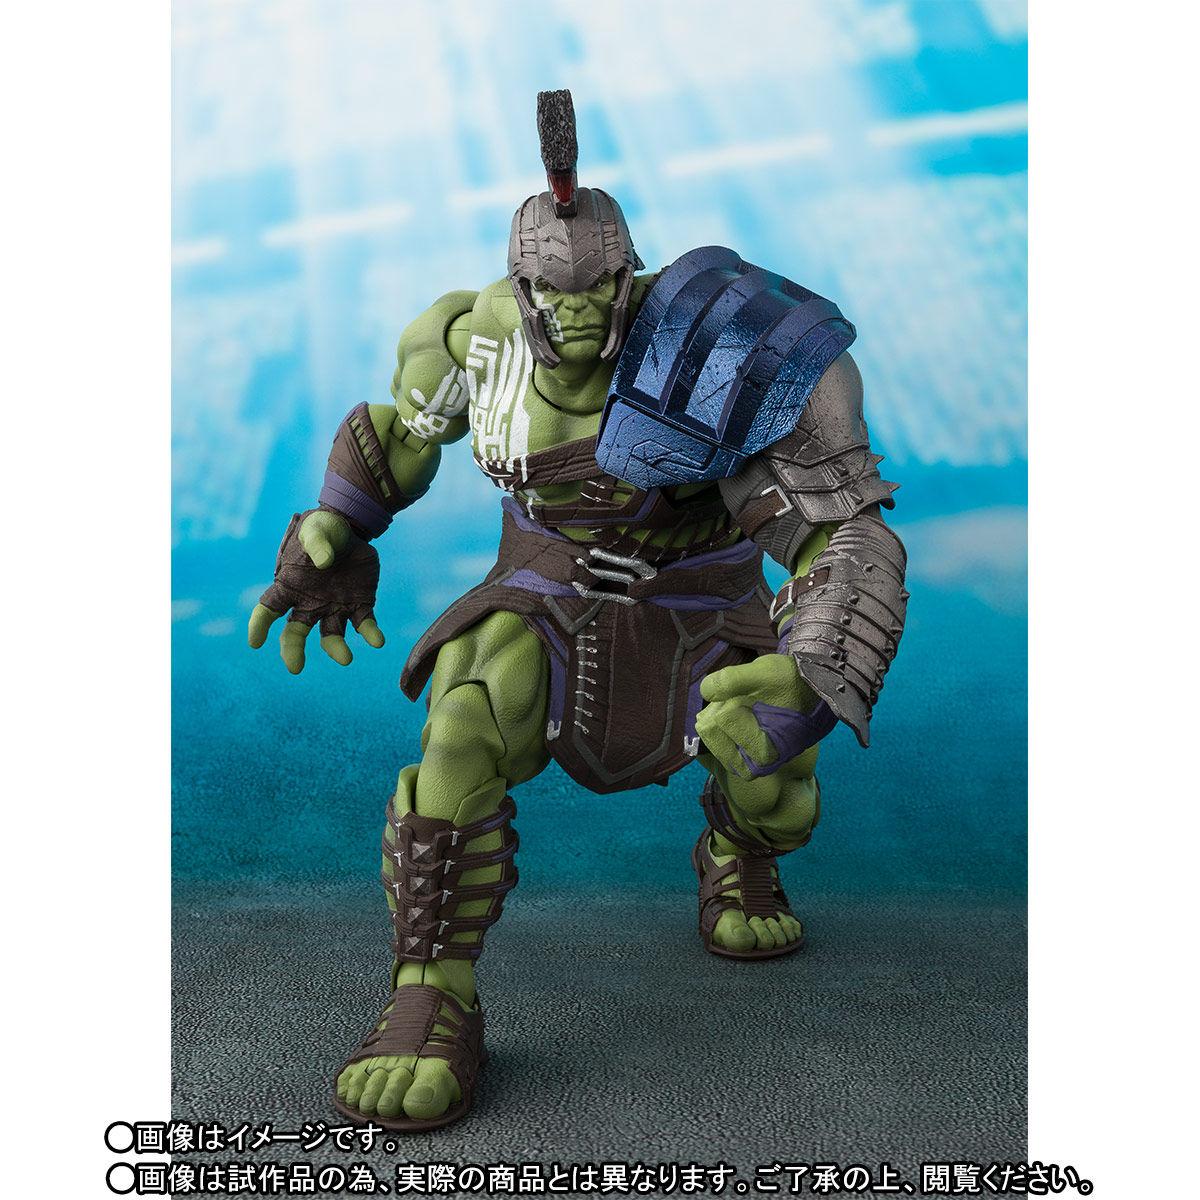 SH-Figuarts-Gladiator-Hulk-005